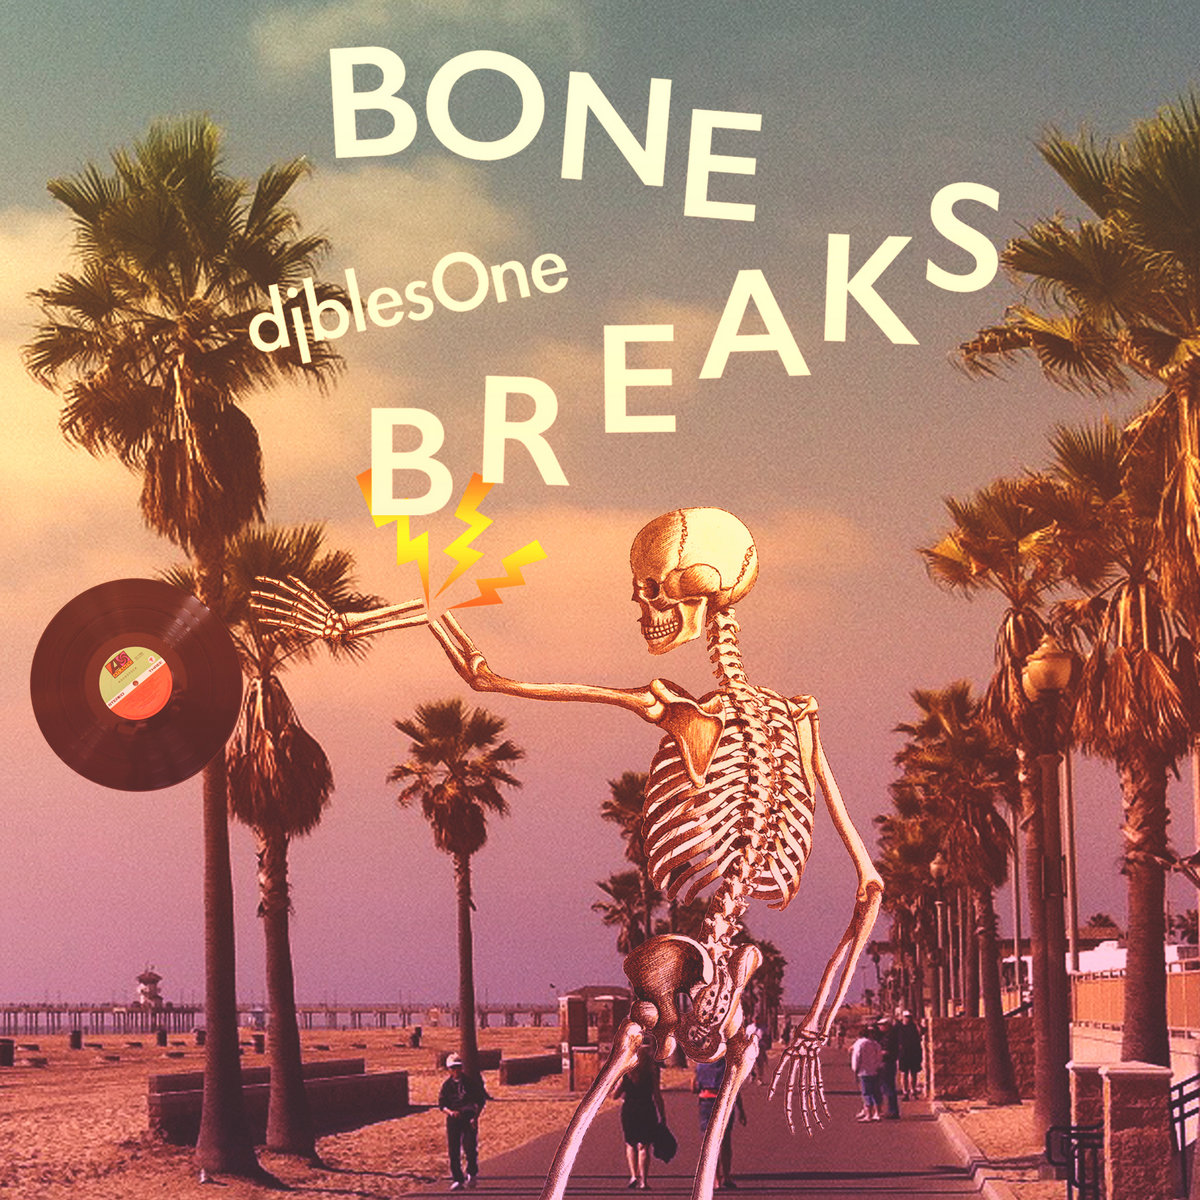 Djblesone Bone Breaks Djblesone